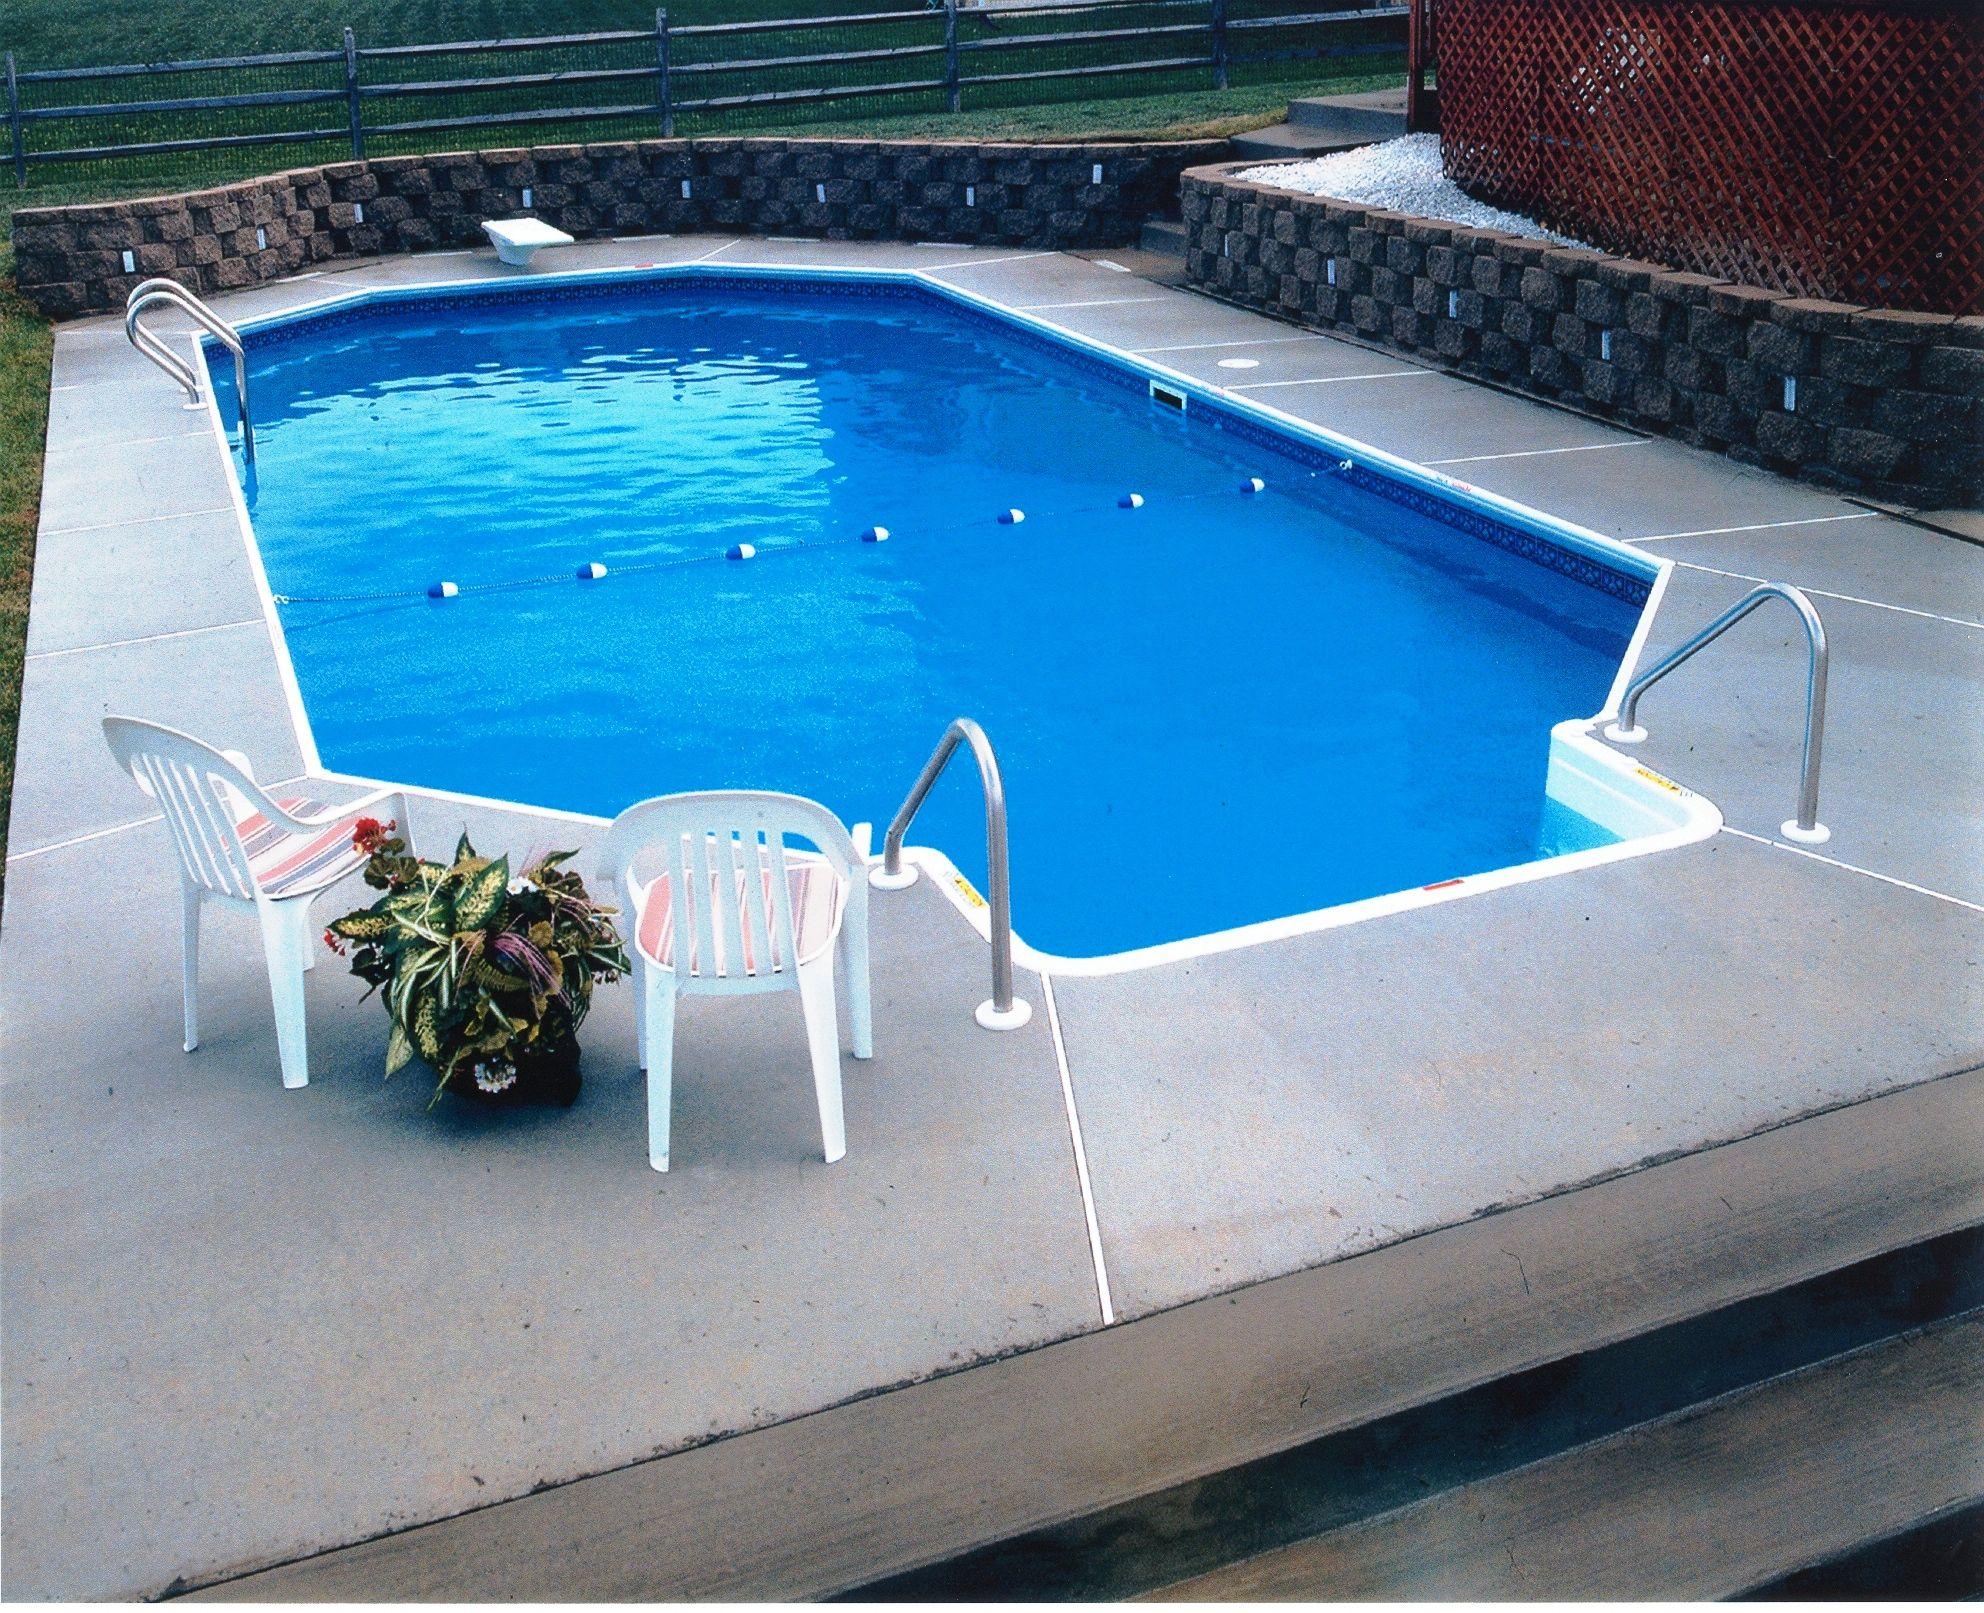 Let A Regina Pools U0026 Spas Professional Help Make Your Dream Pool, Spa, Or  Sauna A Reality.